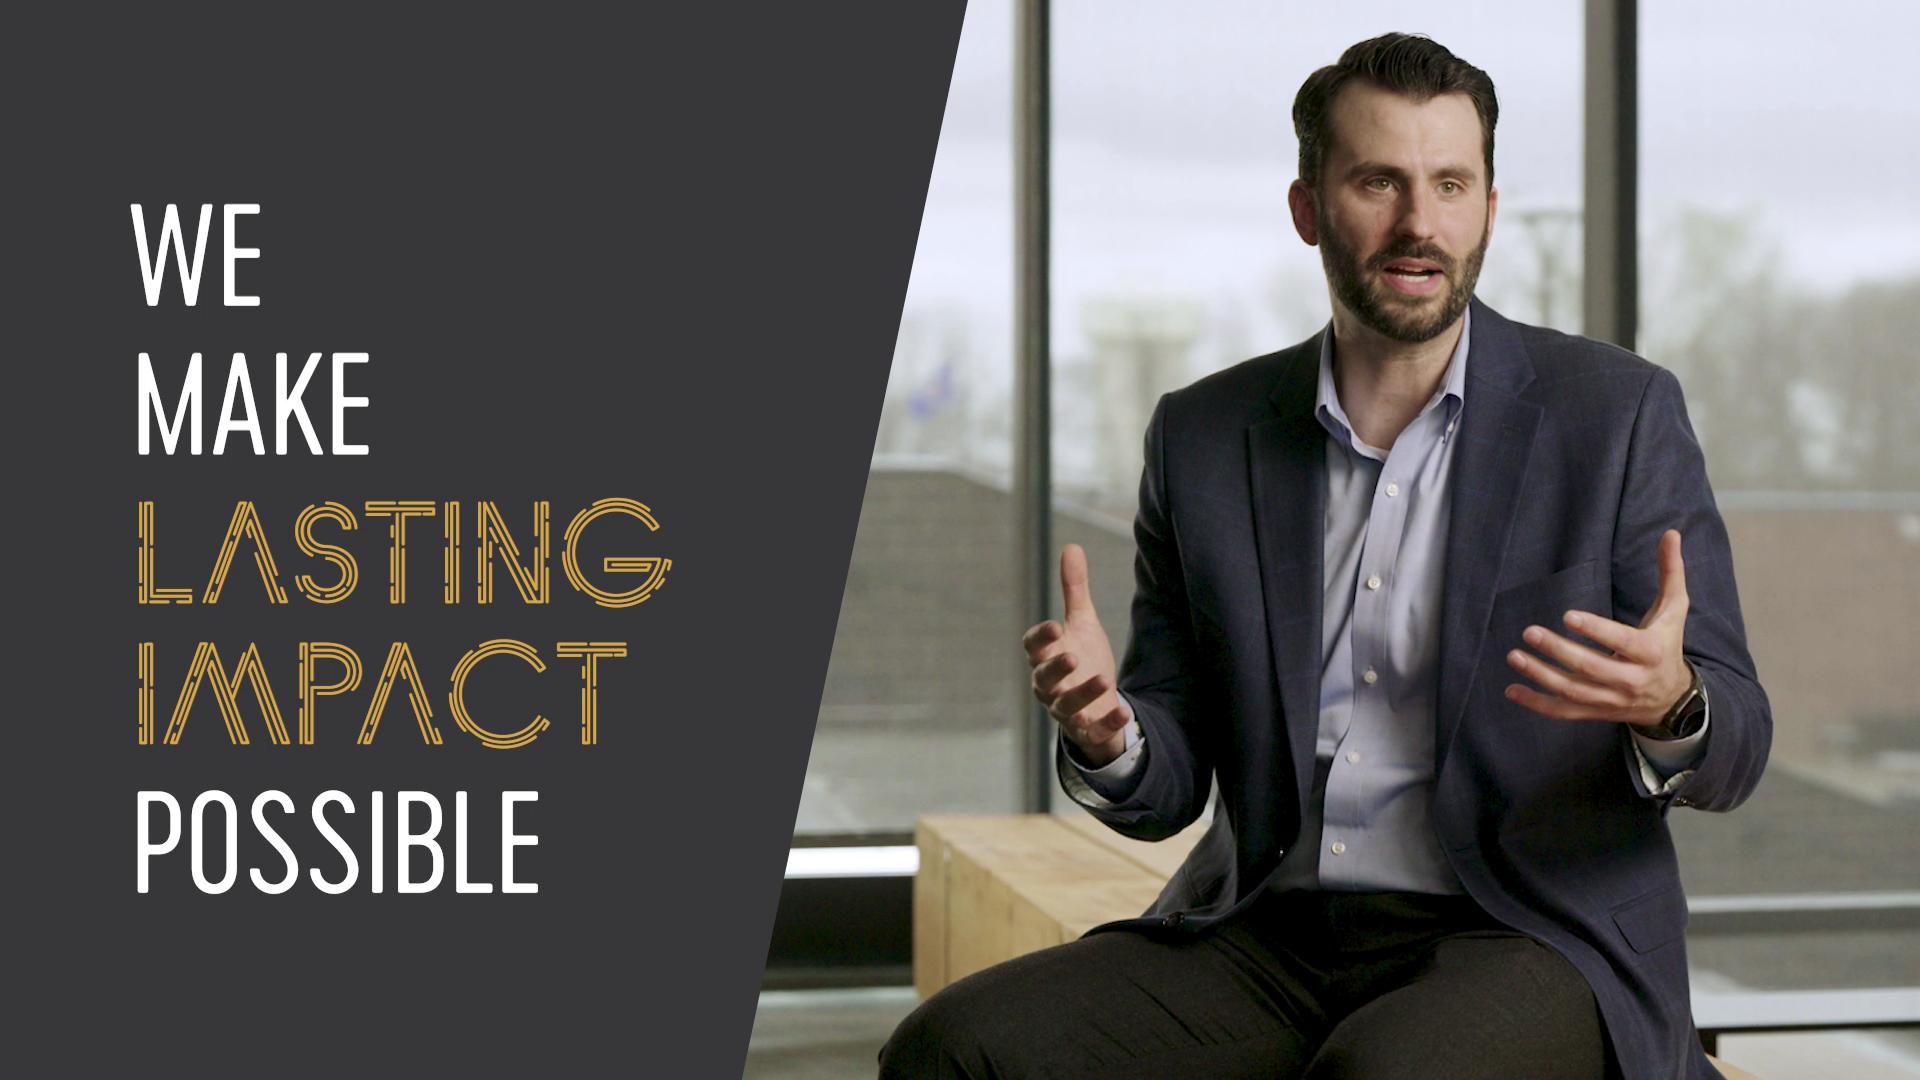 We Make Lasting Impact Possible